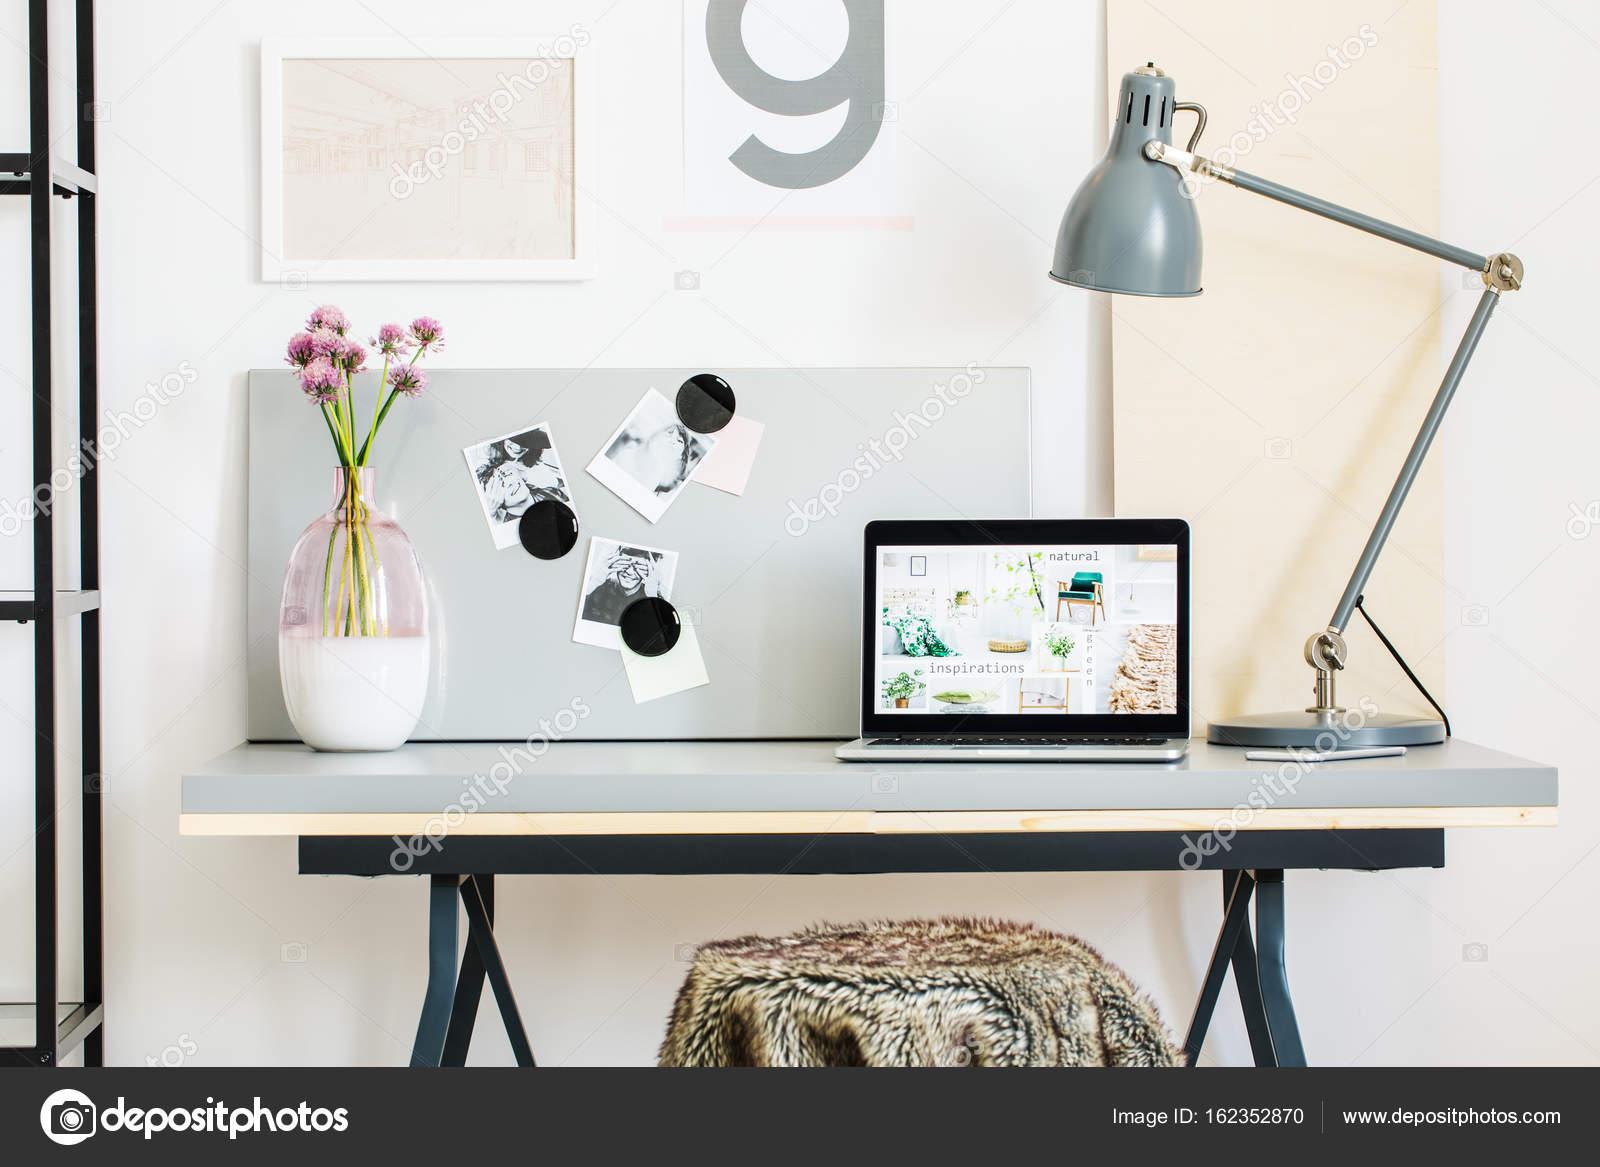 Lampada Scrivania Viola : Moderna scrivania con lampada u2014 foto stock © photographee.eu #162352870